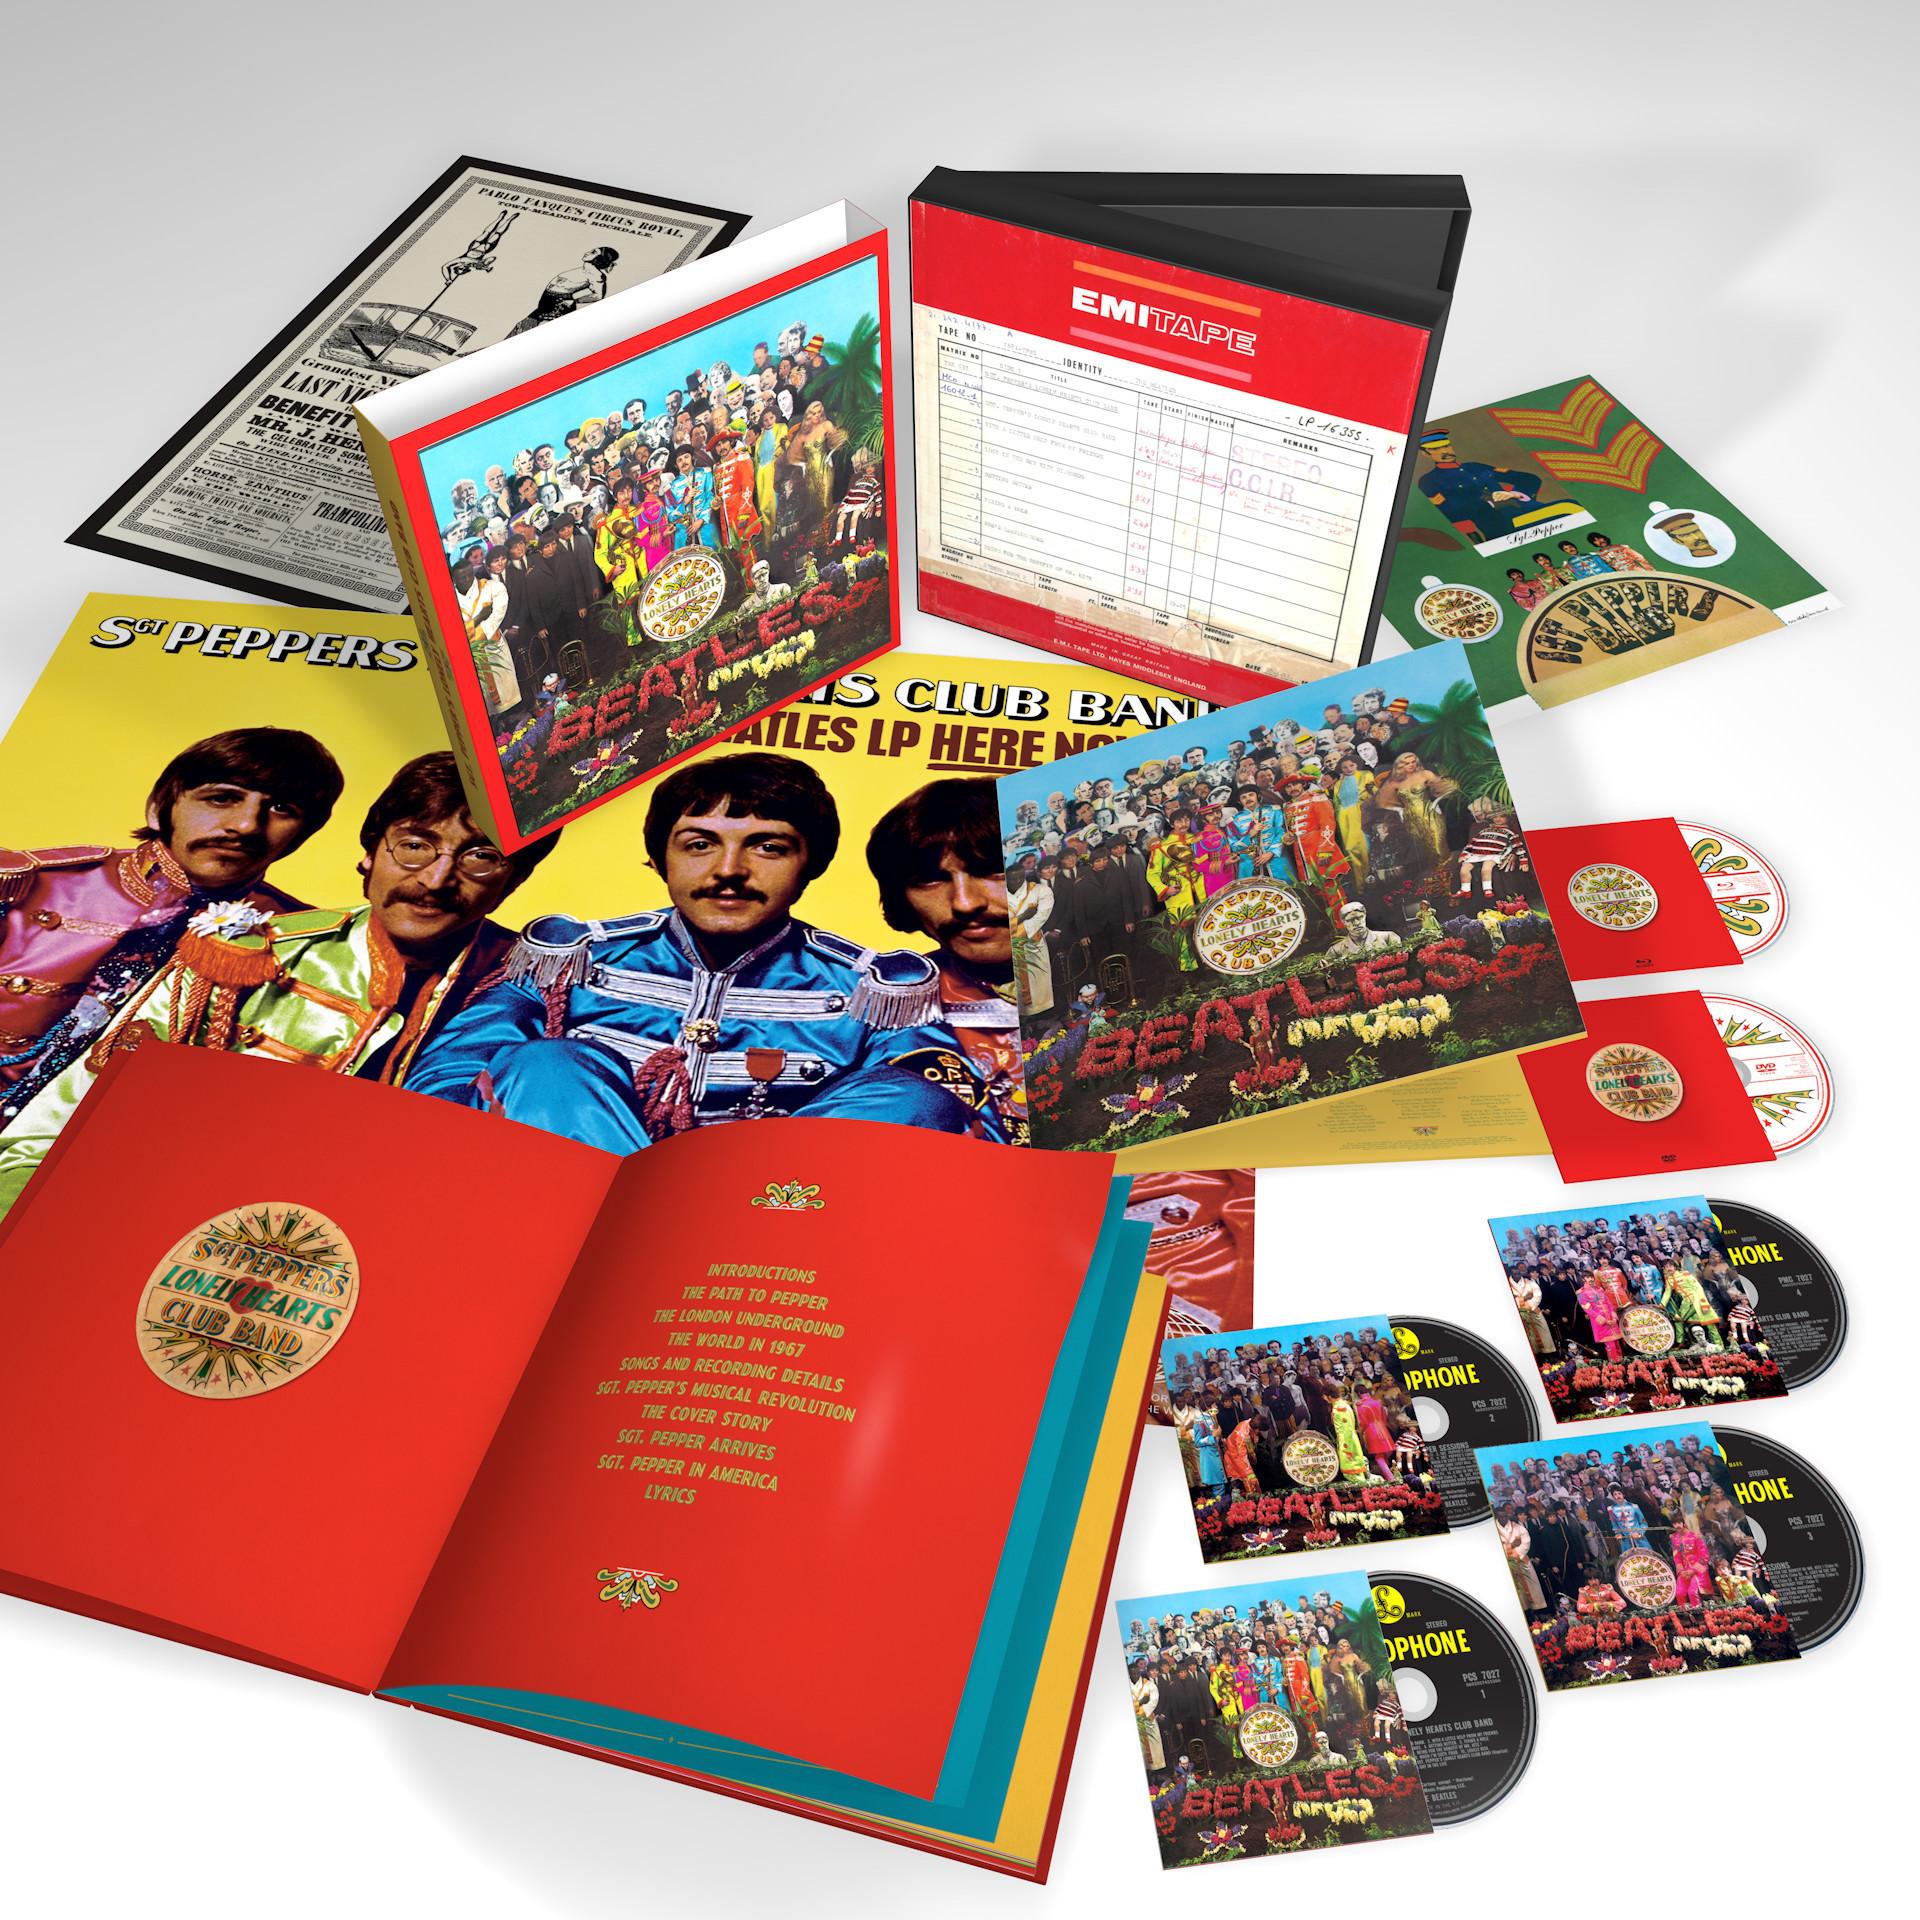 Sgt Pepper Album Cover Here Lies Paul